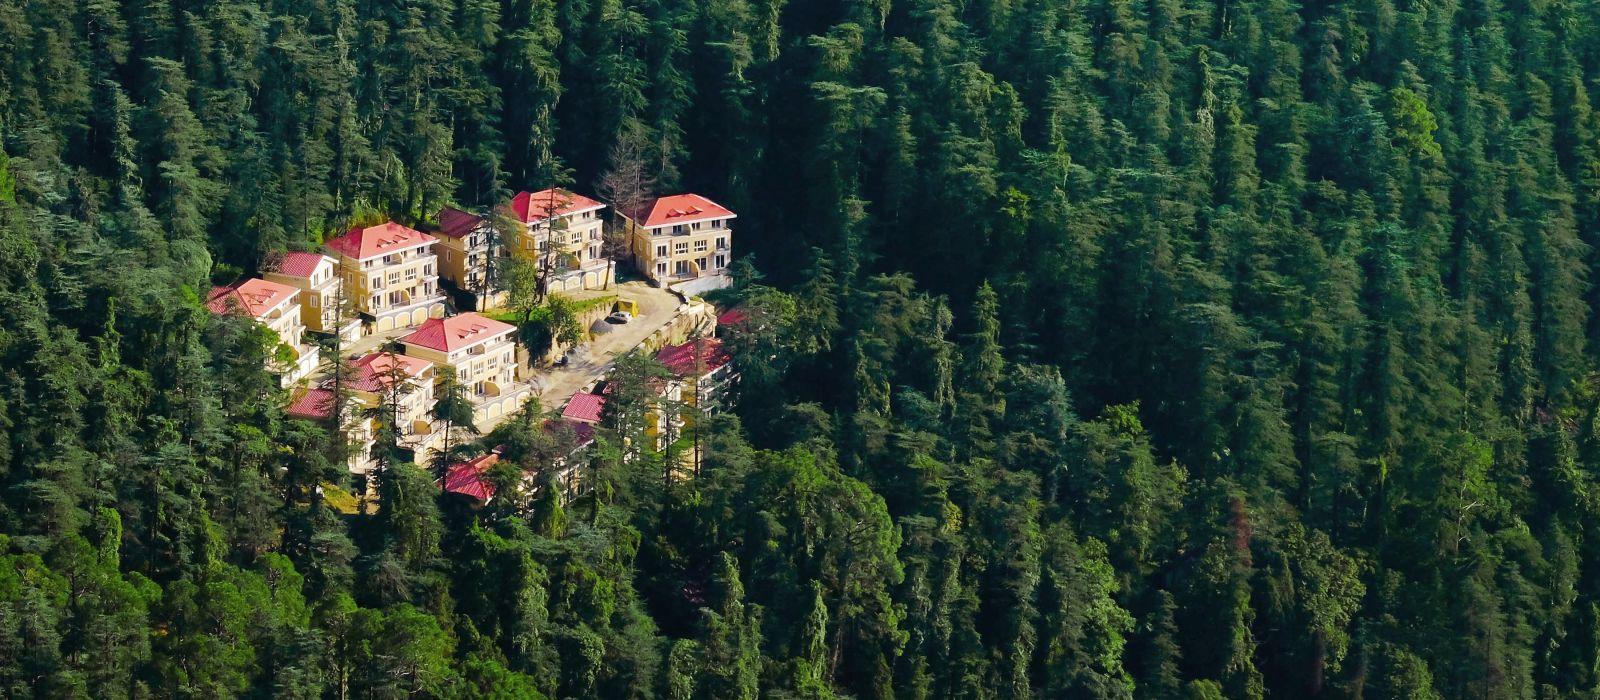 Shimla , Himachal Pradesh, India